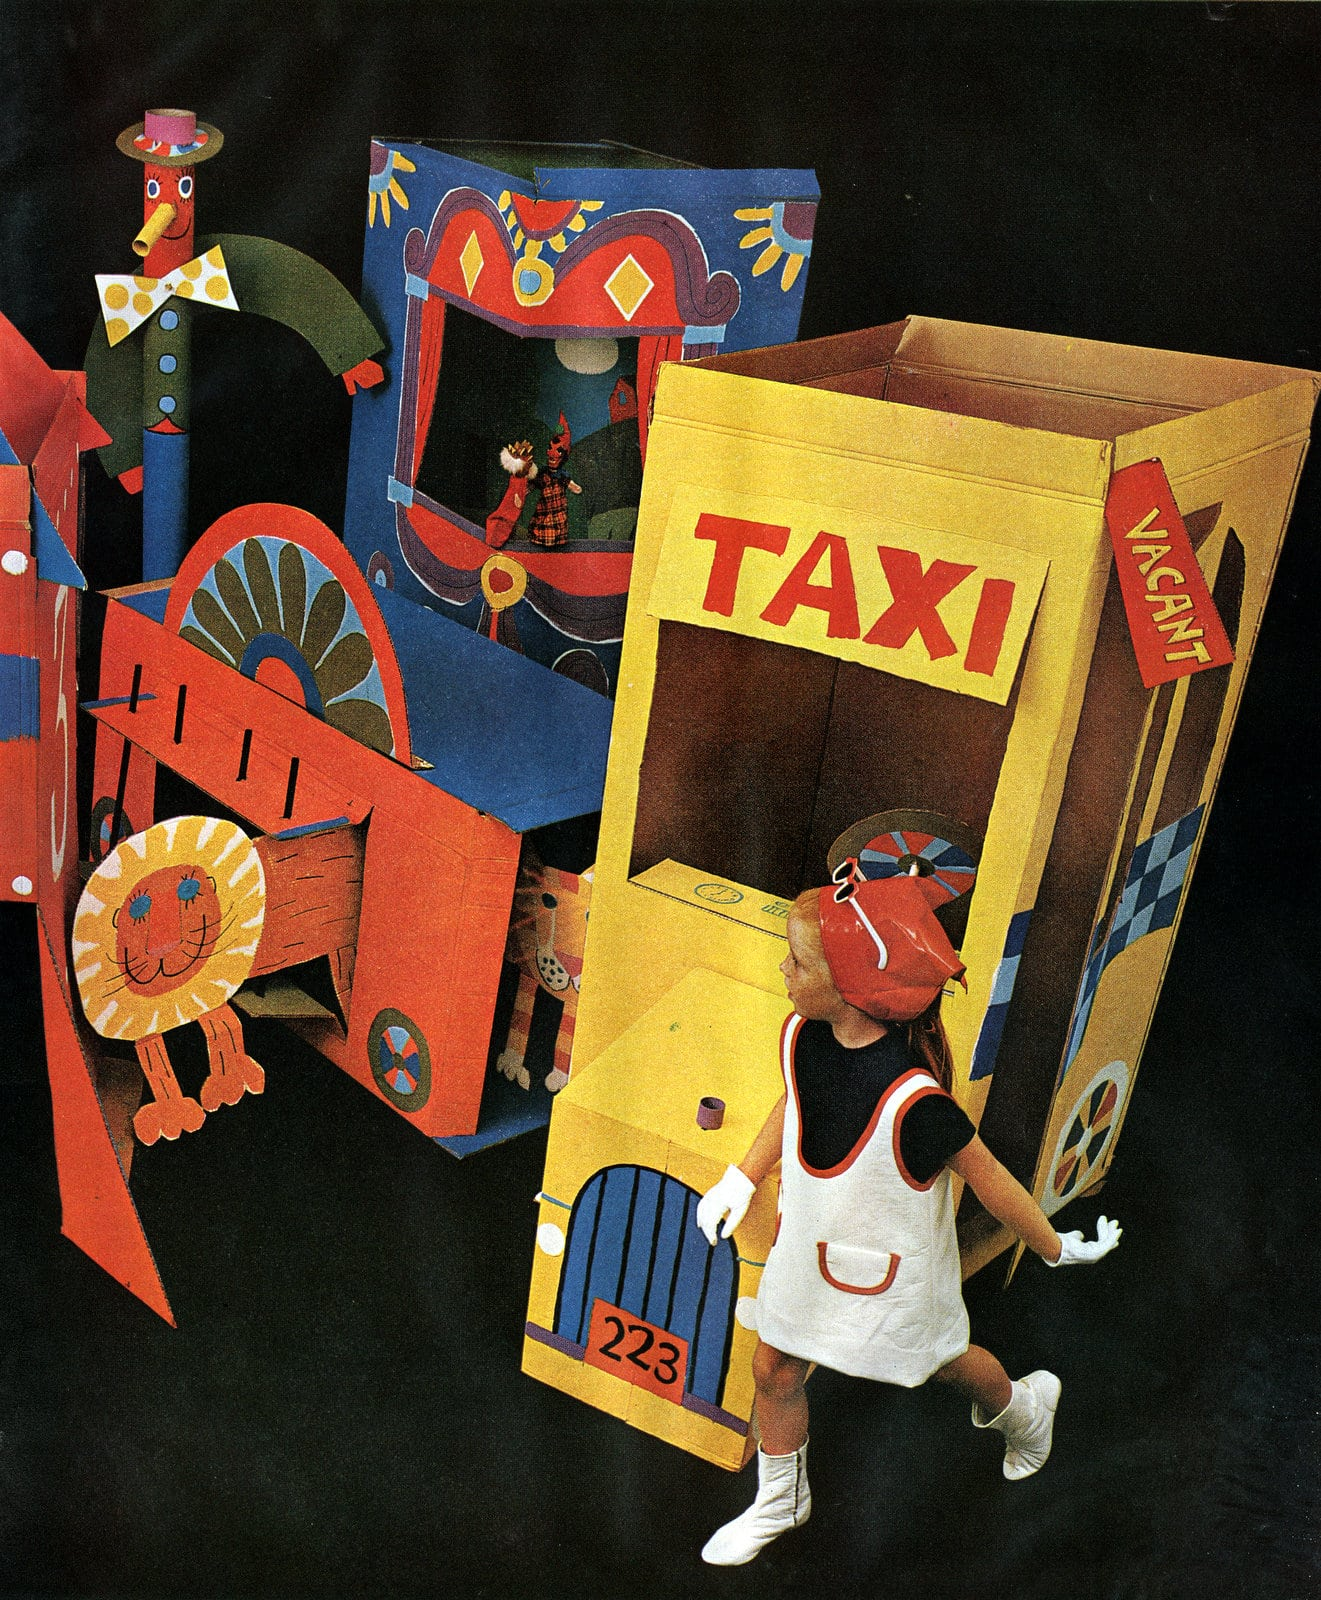 DIY cardboard box forts and playhouses